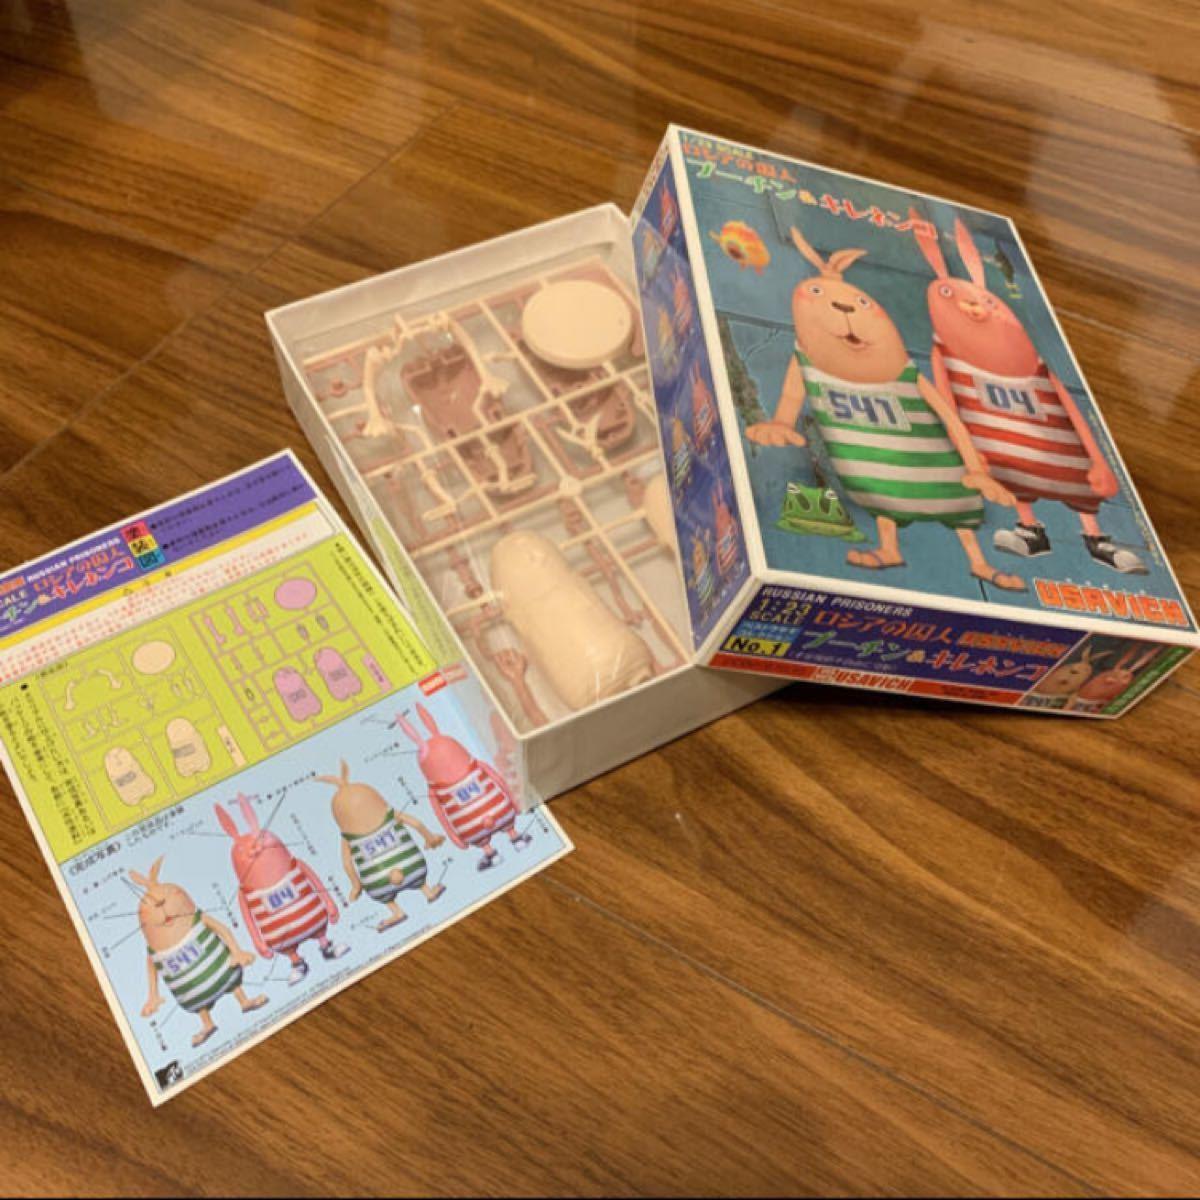 「USAVICH DVD-BOX『プチキレ・BOX』プラモ付き〈数量限定生産・3枚組〉」